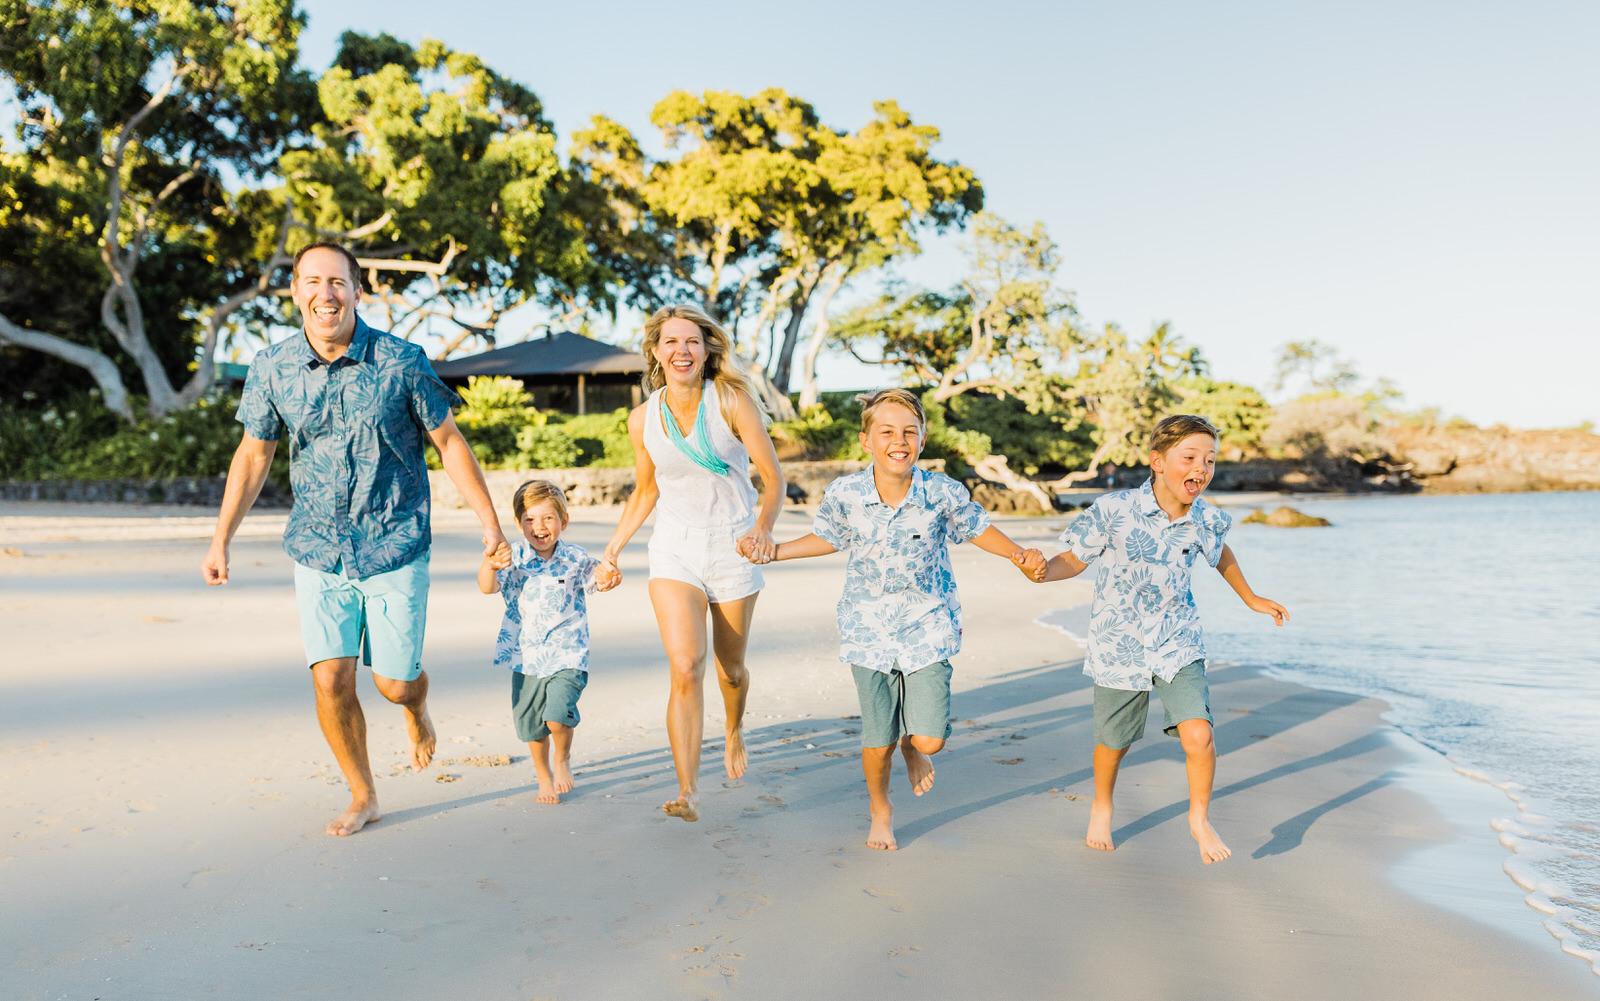 big-island-photographer-family-session-mauna-kea-resort-summer-waikoloa-sunrise-3632.jpg